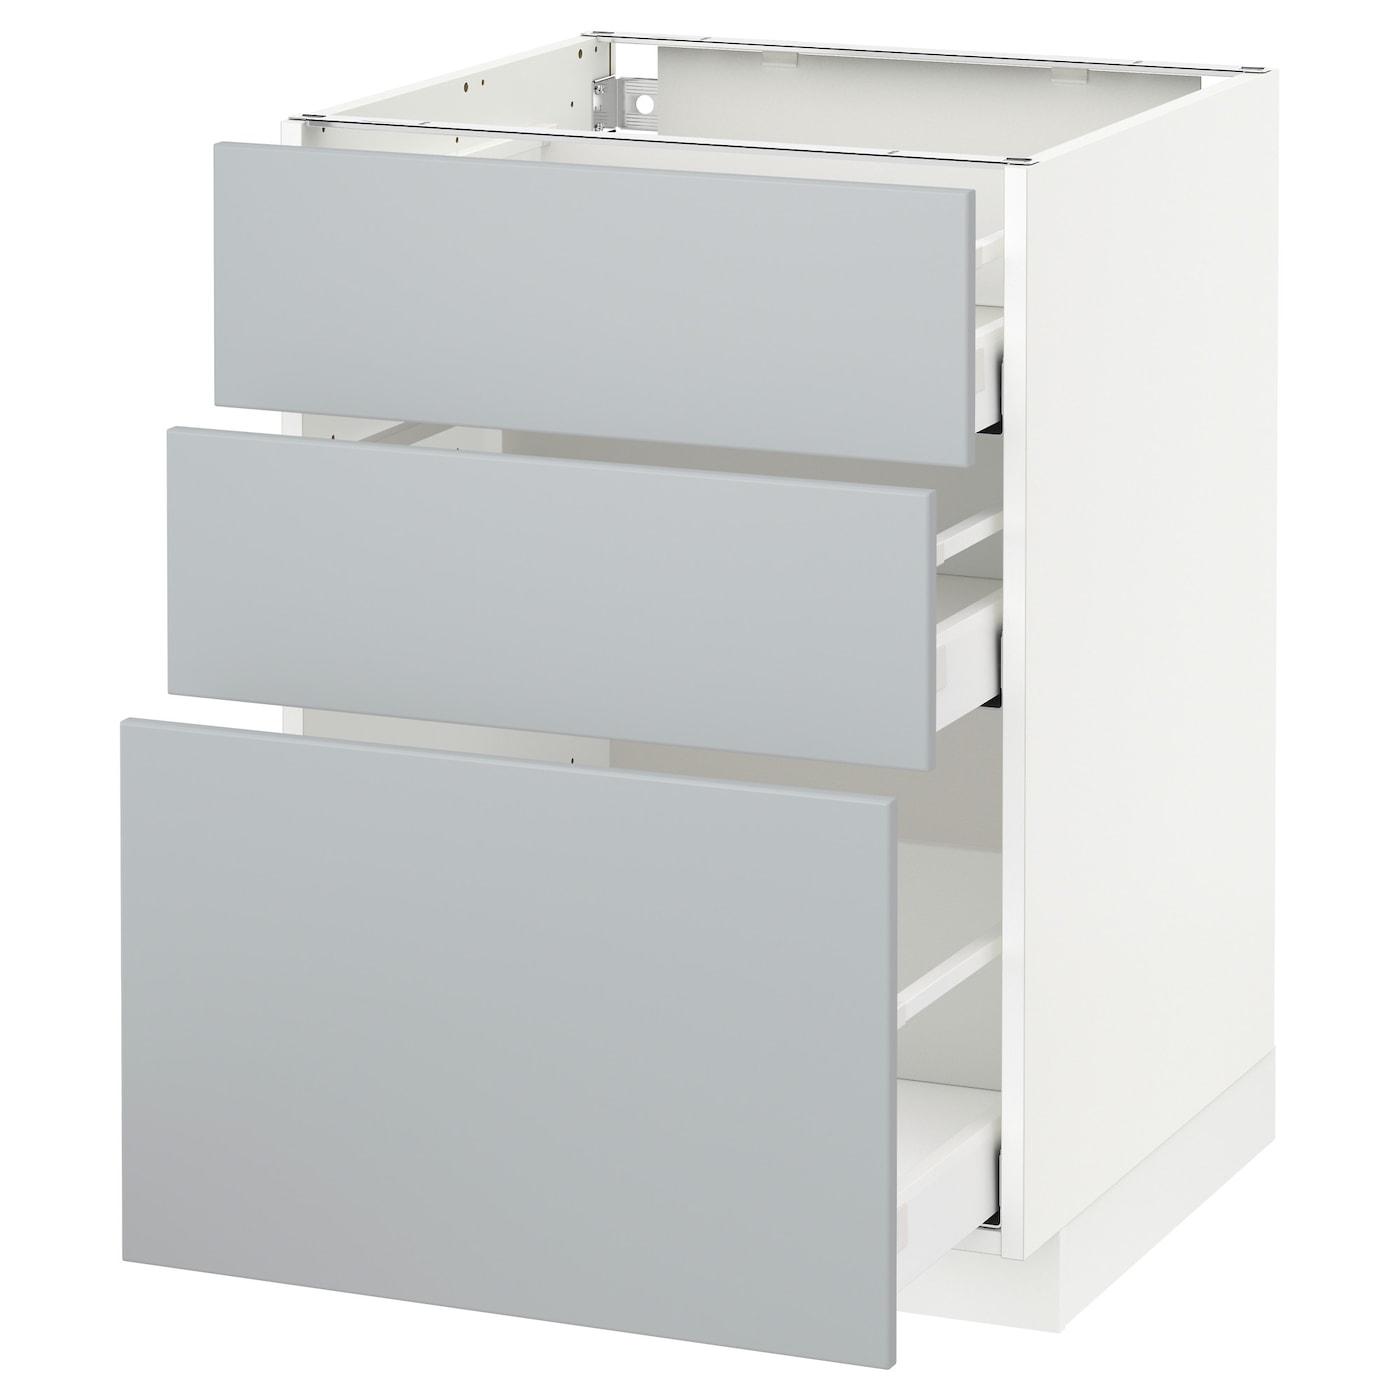 METOD / MAXIMERA Élément bas 14 tiroirs - blanc/Veddinge gris 14x14 cm